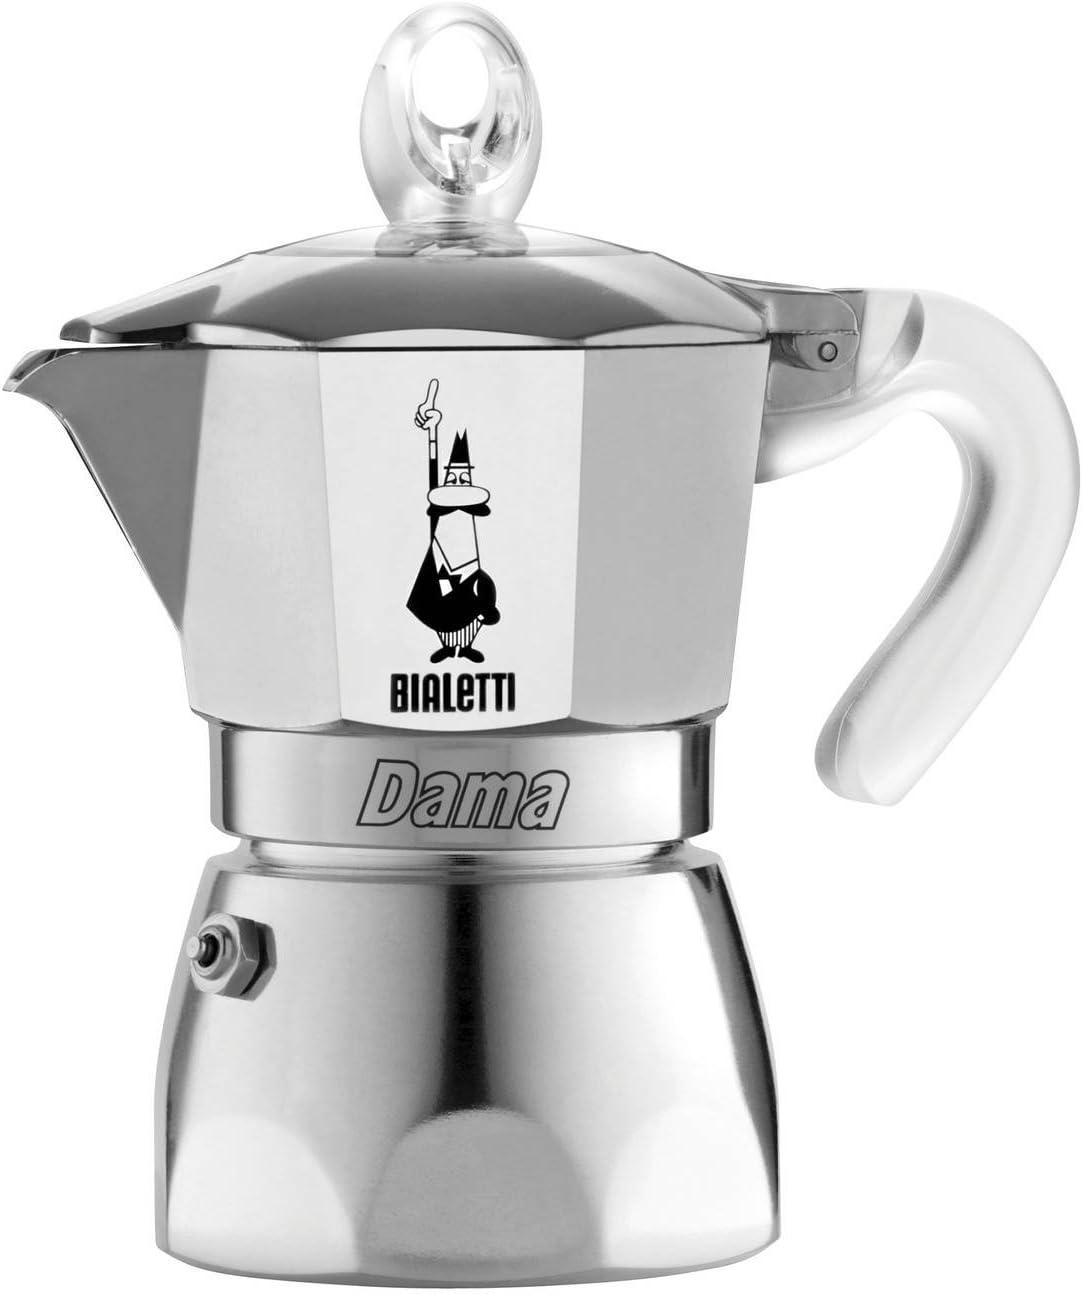 Bialetti Dama Vanity 3 Cups transparente Cafetera de 3 tazas ...